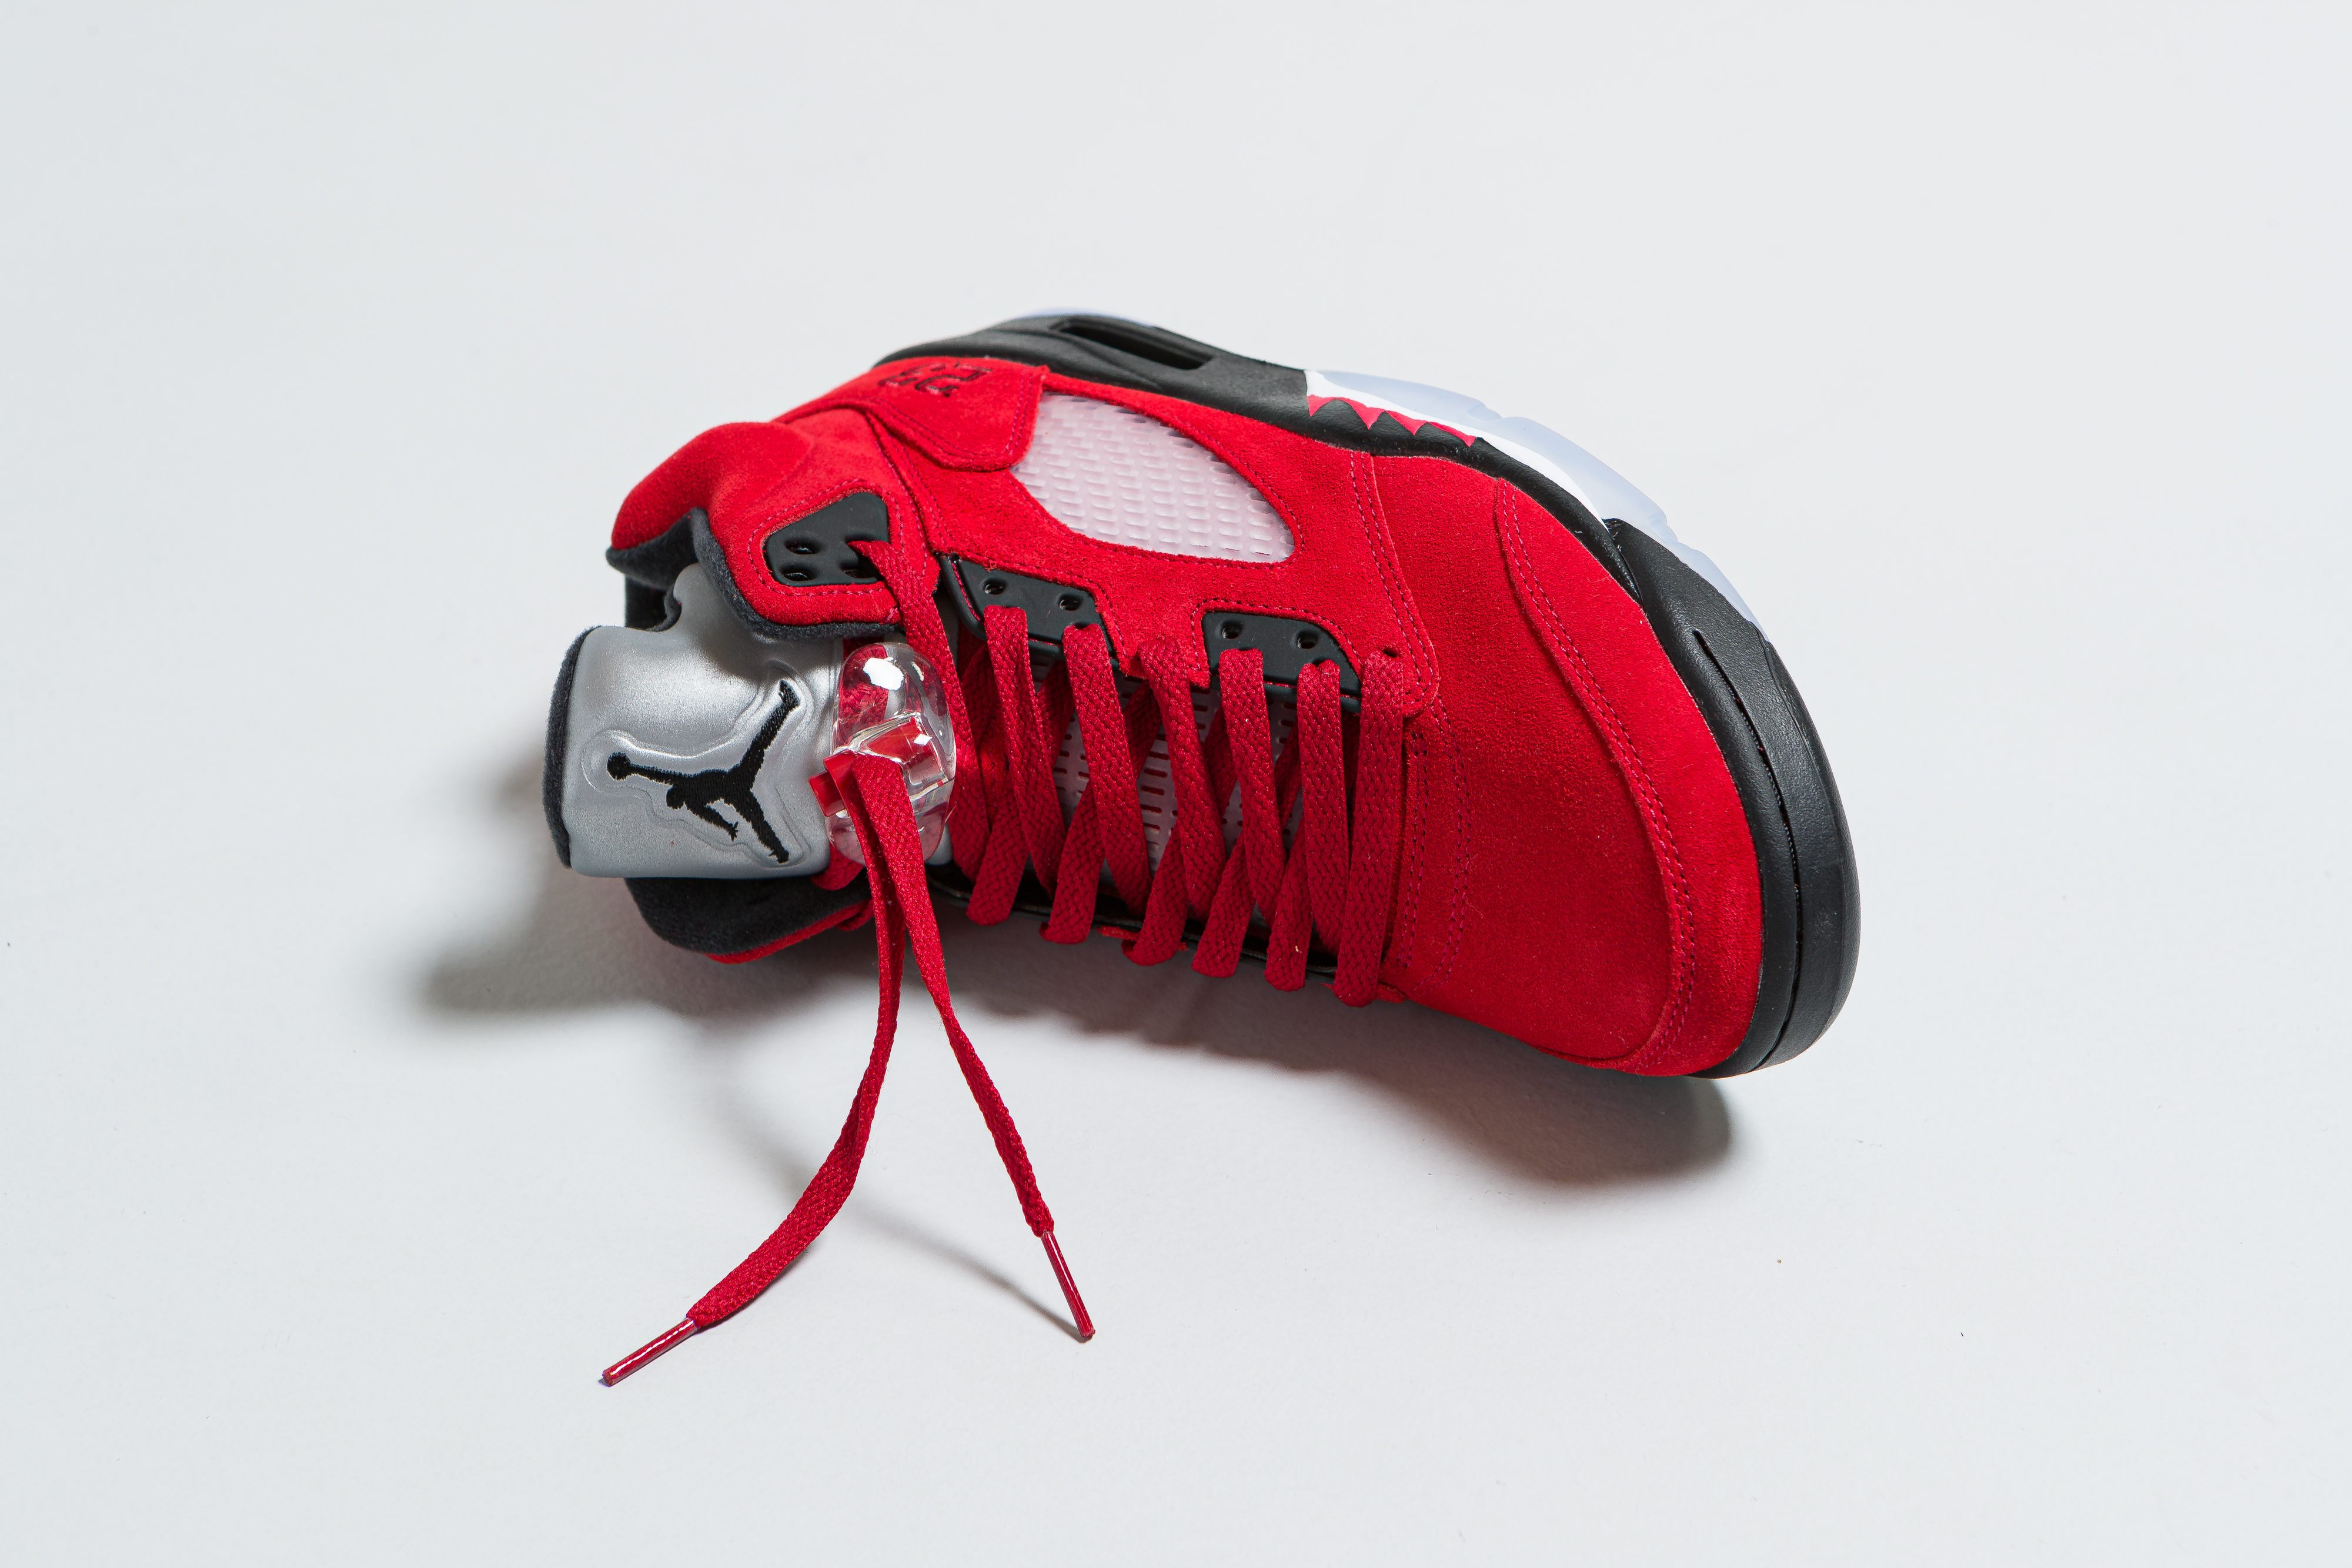 Up There Launches - Air Jordan 5 Retro - Varsity Red/Black-White 'Raging Bull'